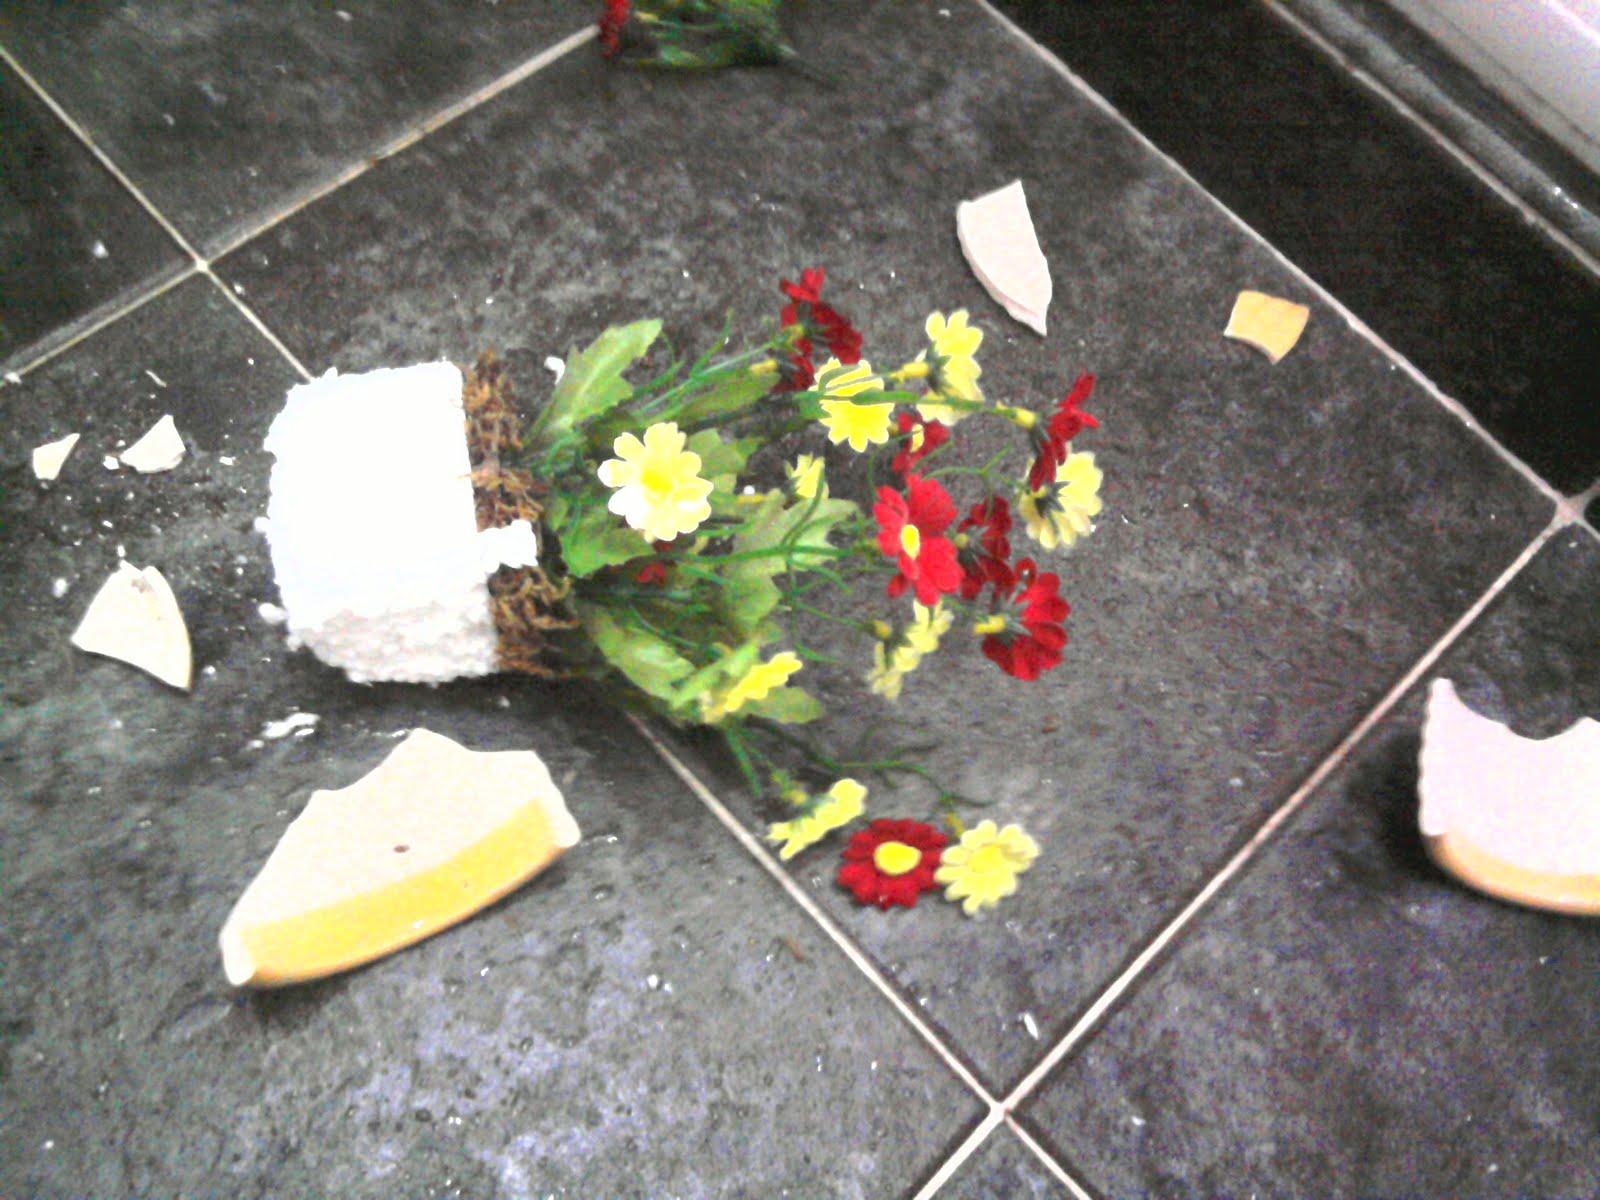 Sketsa Bunga Contoh Lukisan Pasu Bunga Pecah Di Atas Lantai